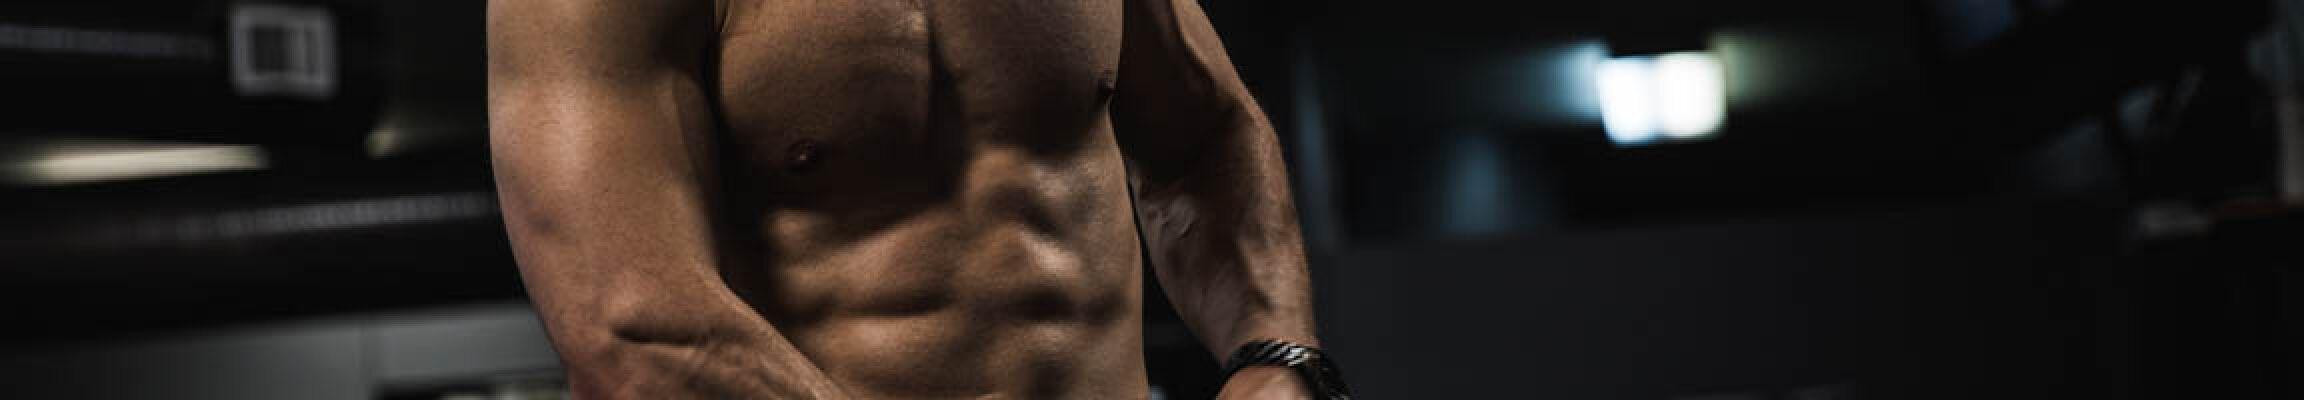 Alkohol und Muskelaufbau - Funktioniert der Muskelaufbau trotz Alkohol?